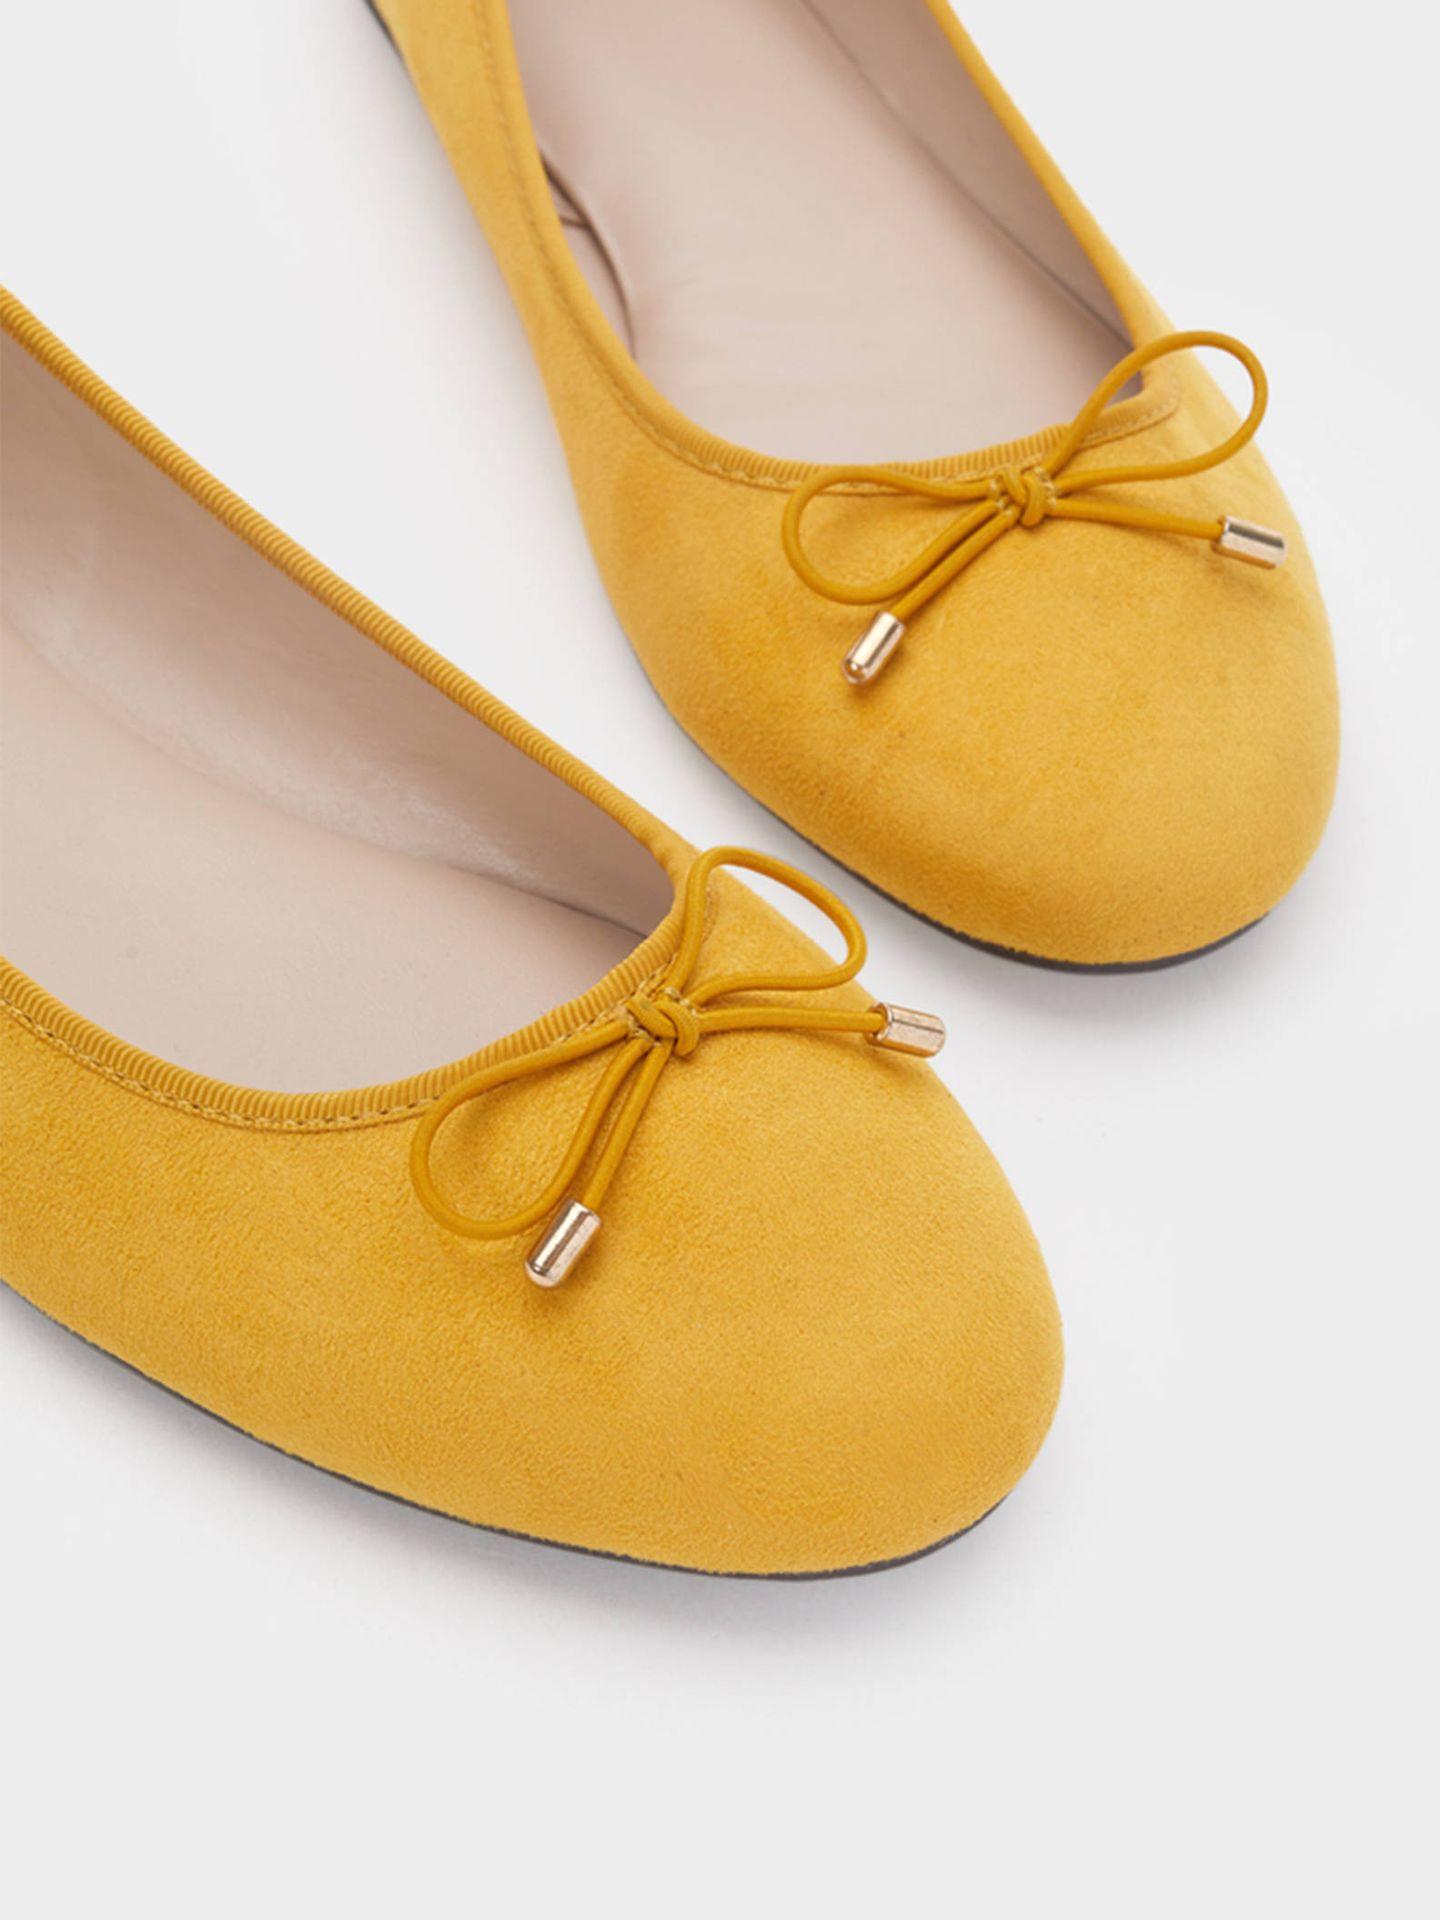 Zapatos de Parfois. (Cortesía)